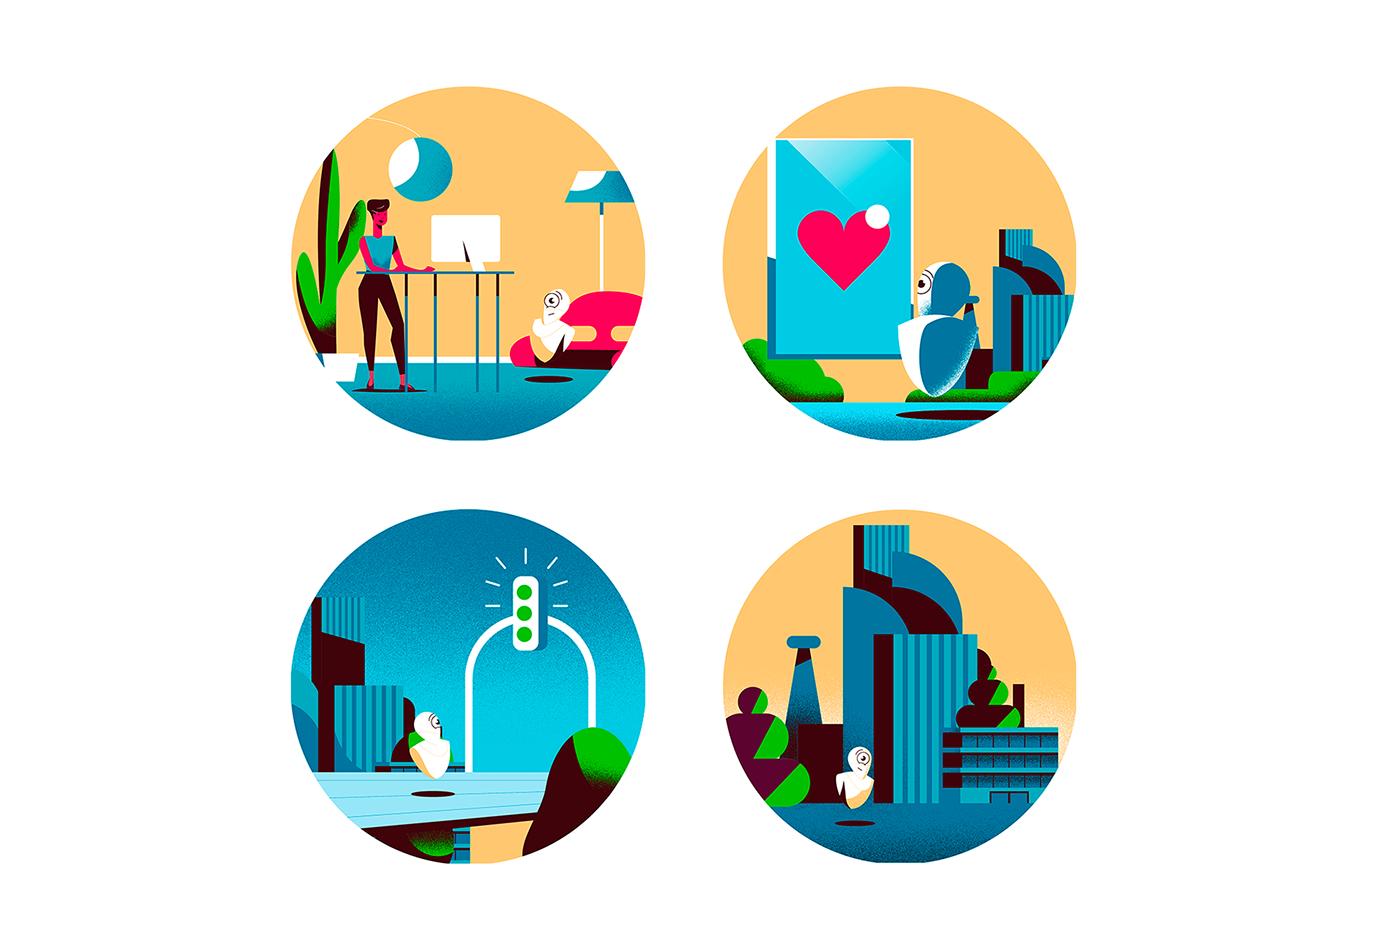 city design job colors portrait Illustrator future sci-fi science robot